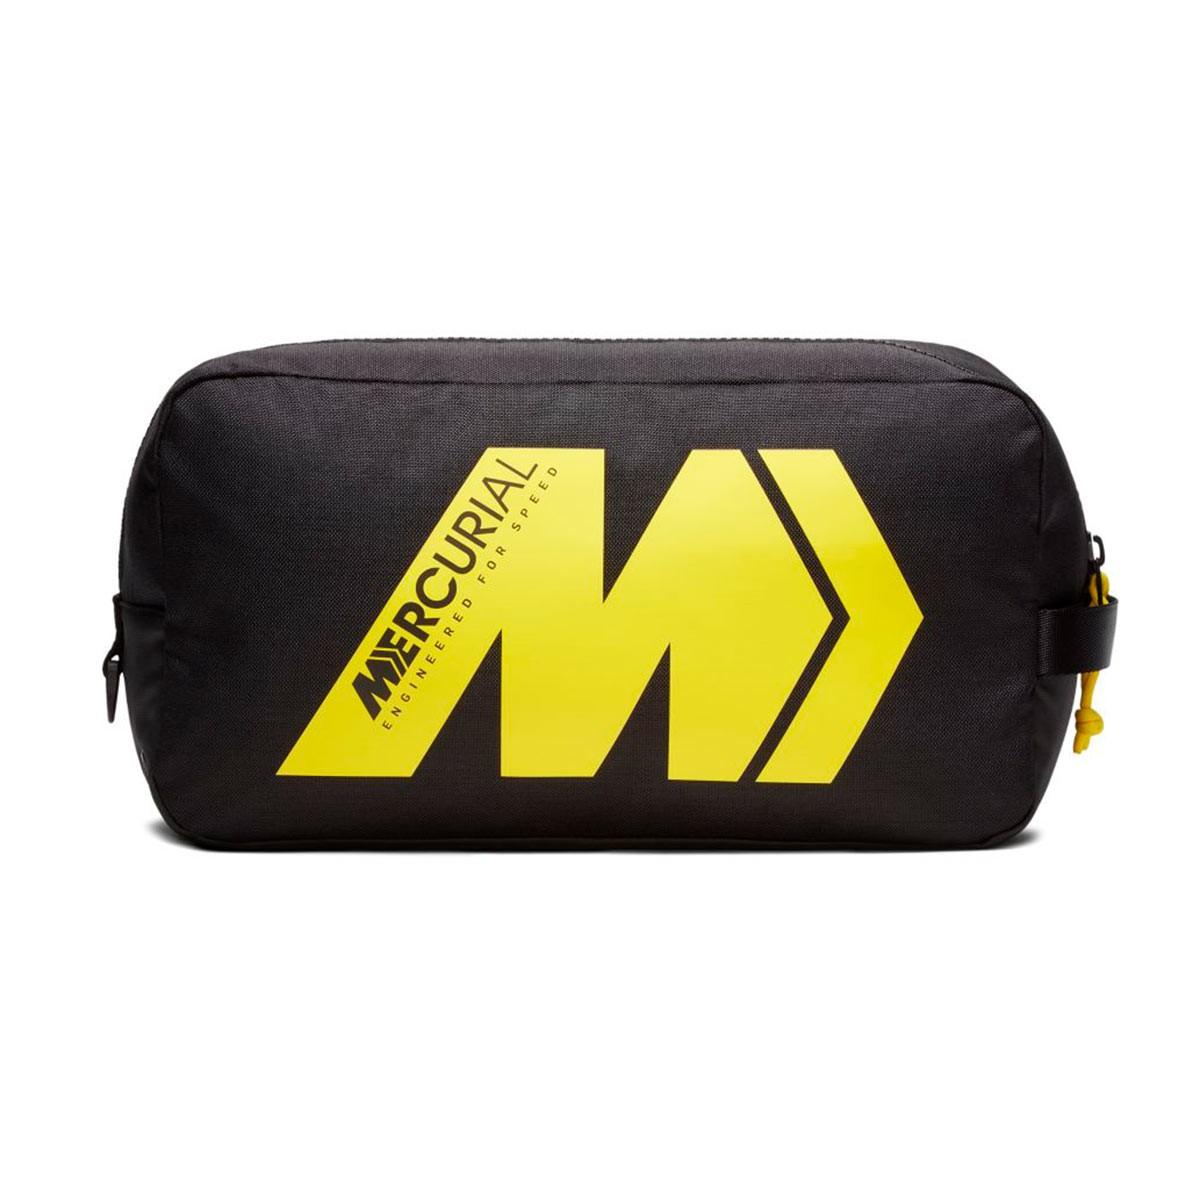 Portascarpe Nike Academy Black Optical yellow Negozio di  VGOnII